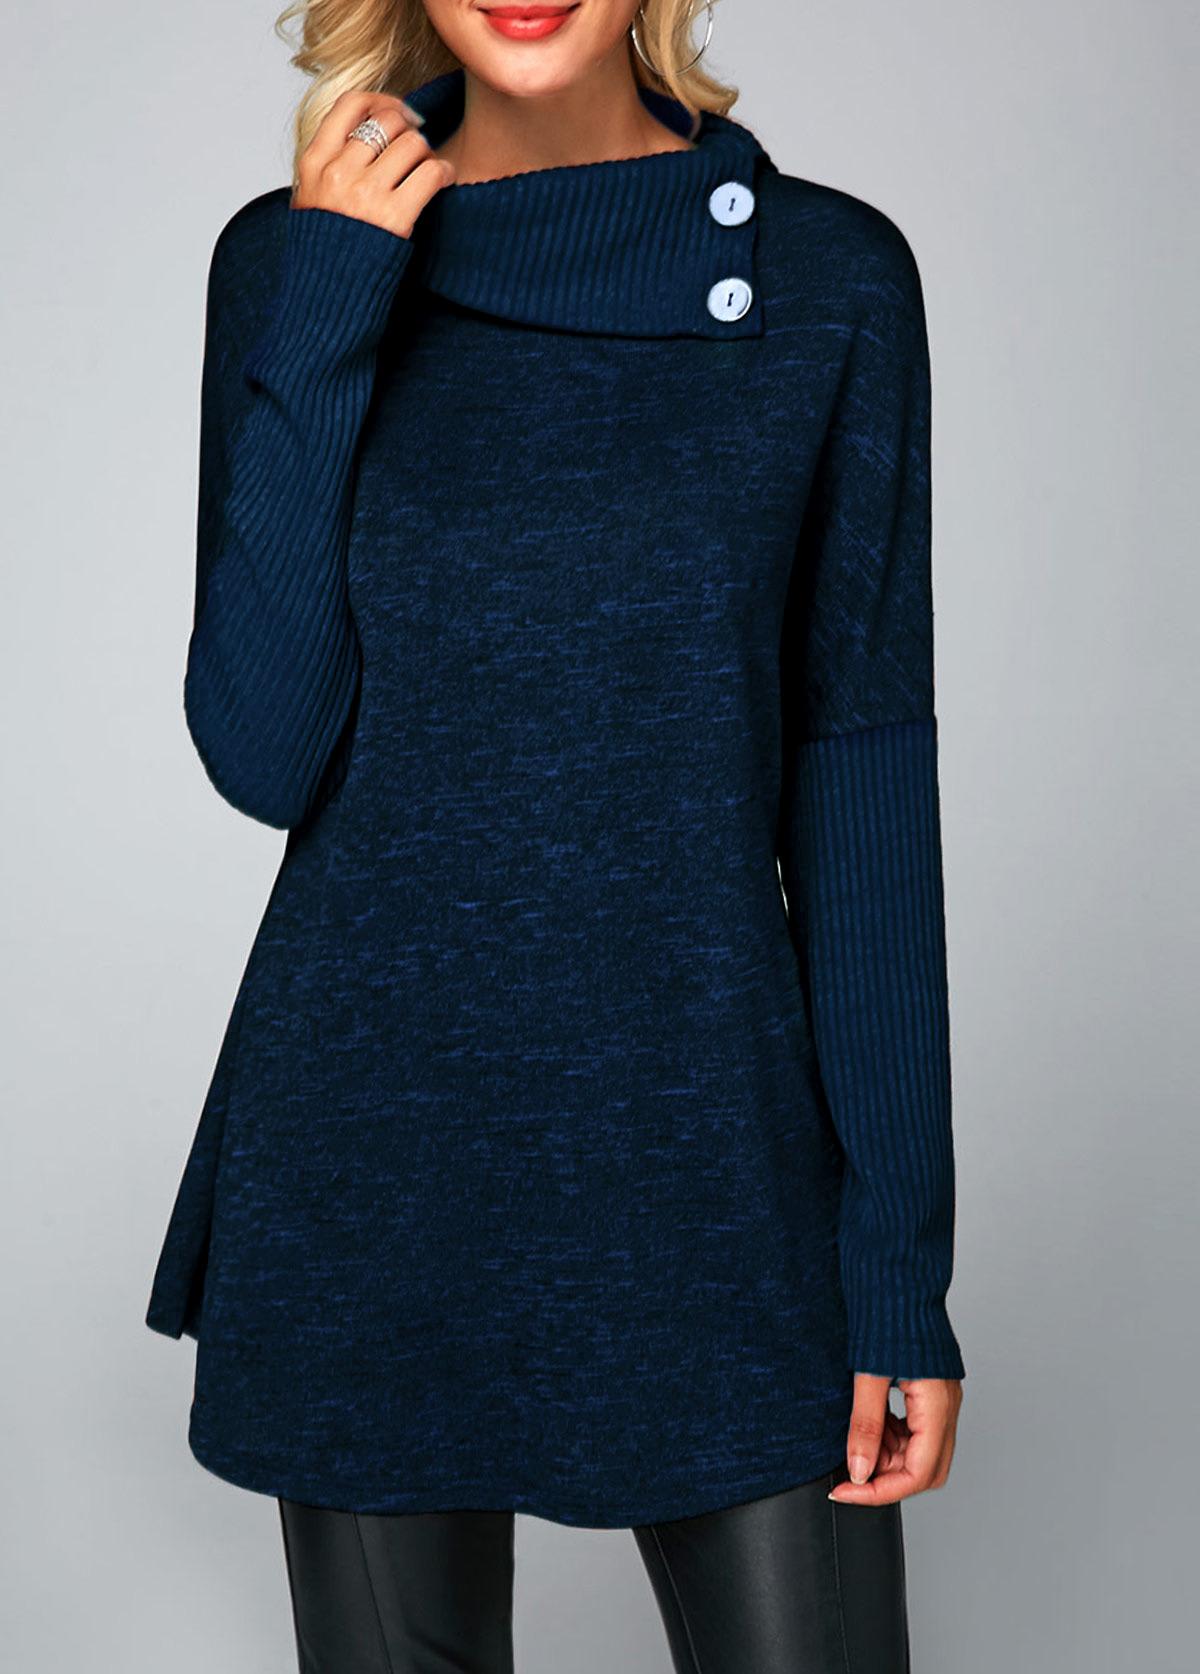 Long Sleeve Button Detail Royal Blue Tunic T Shirt